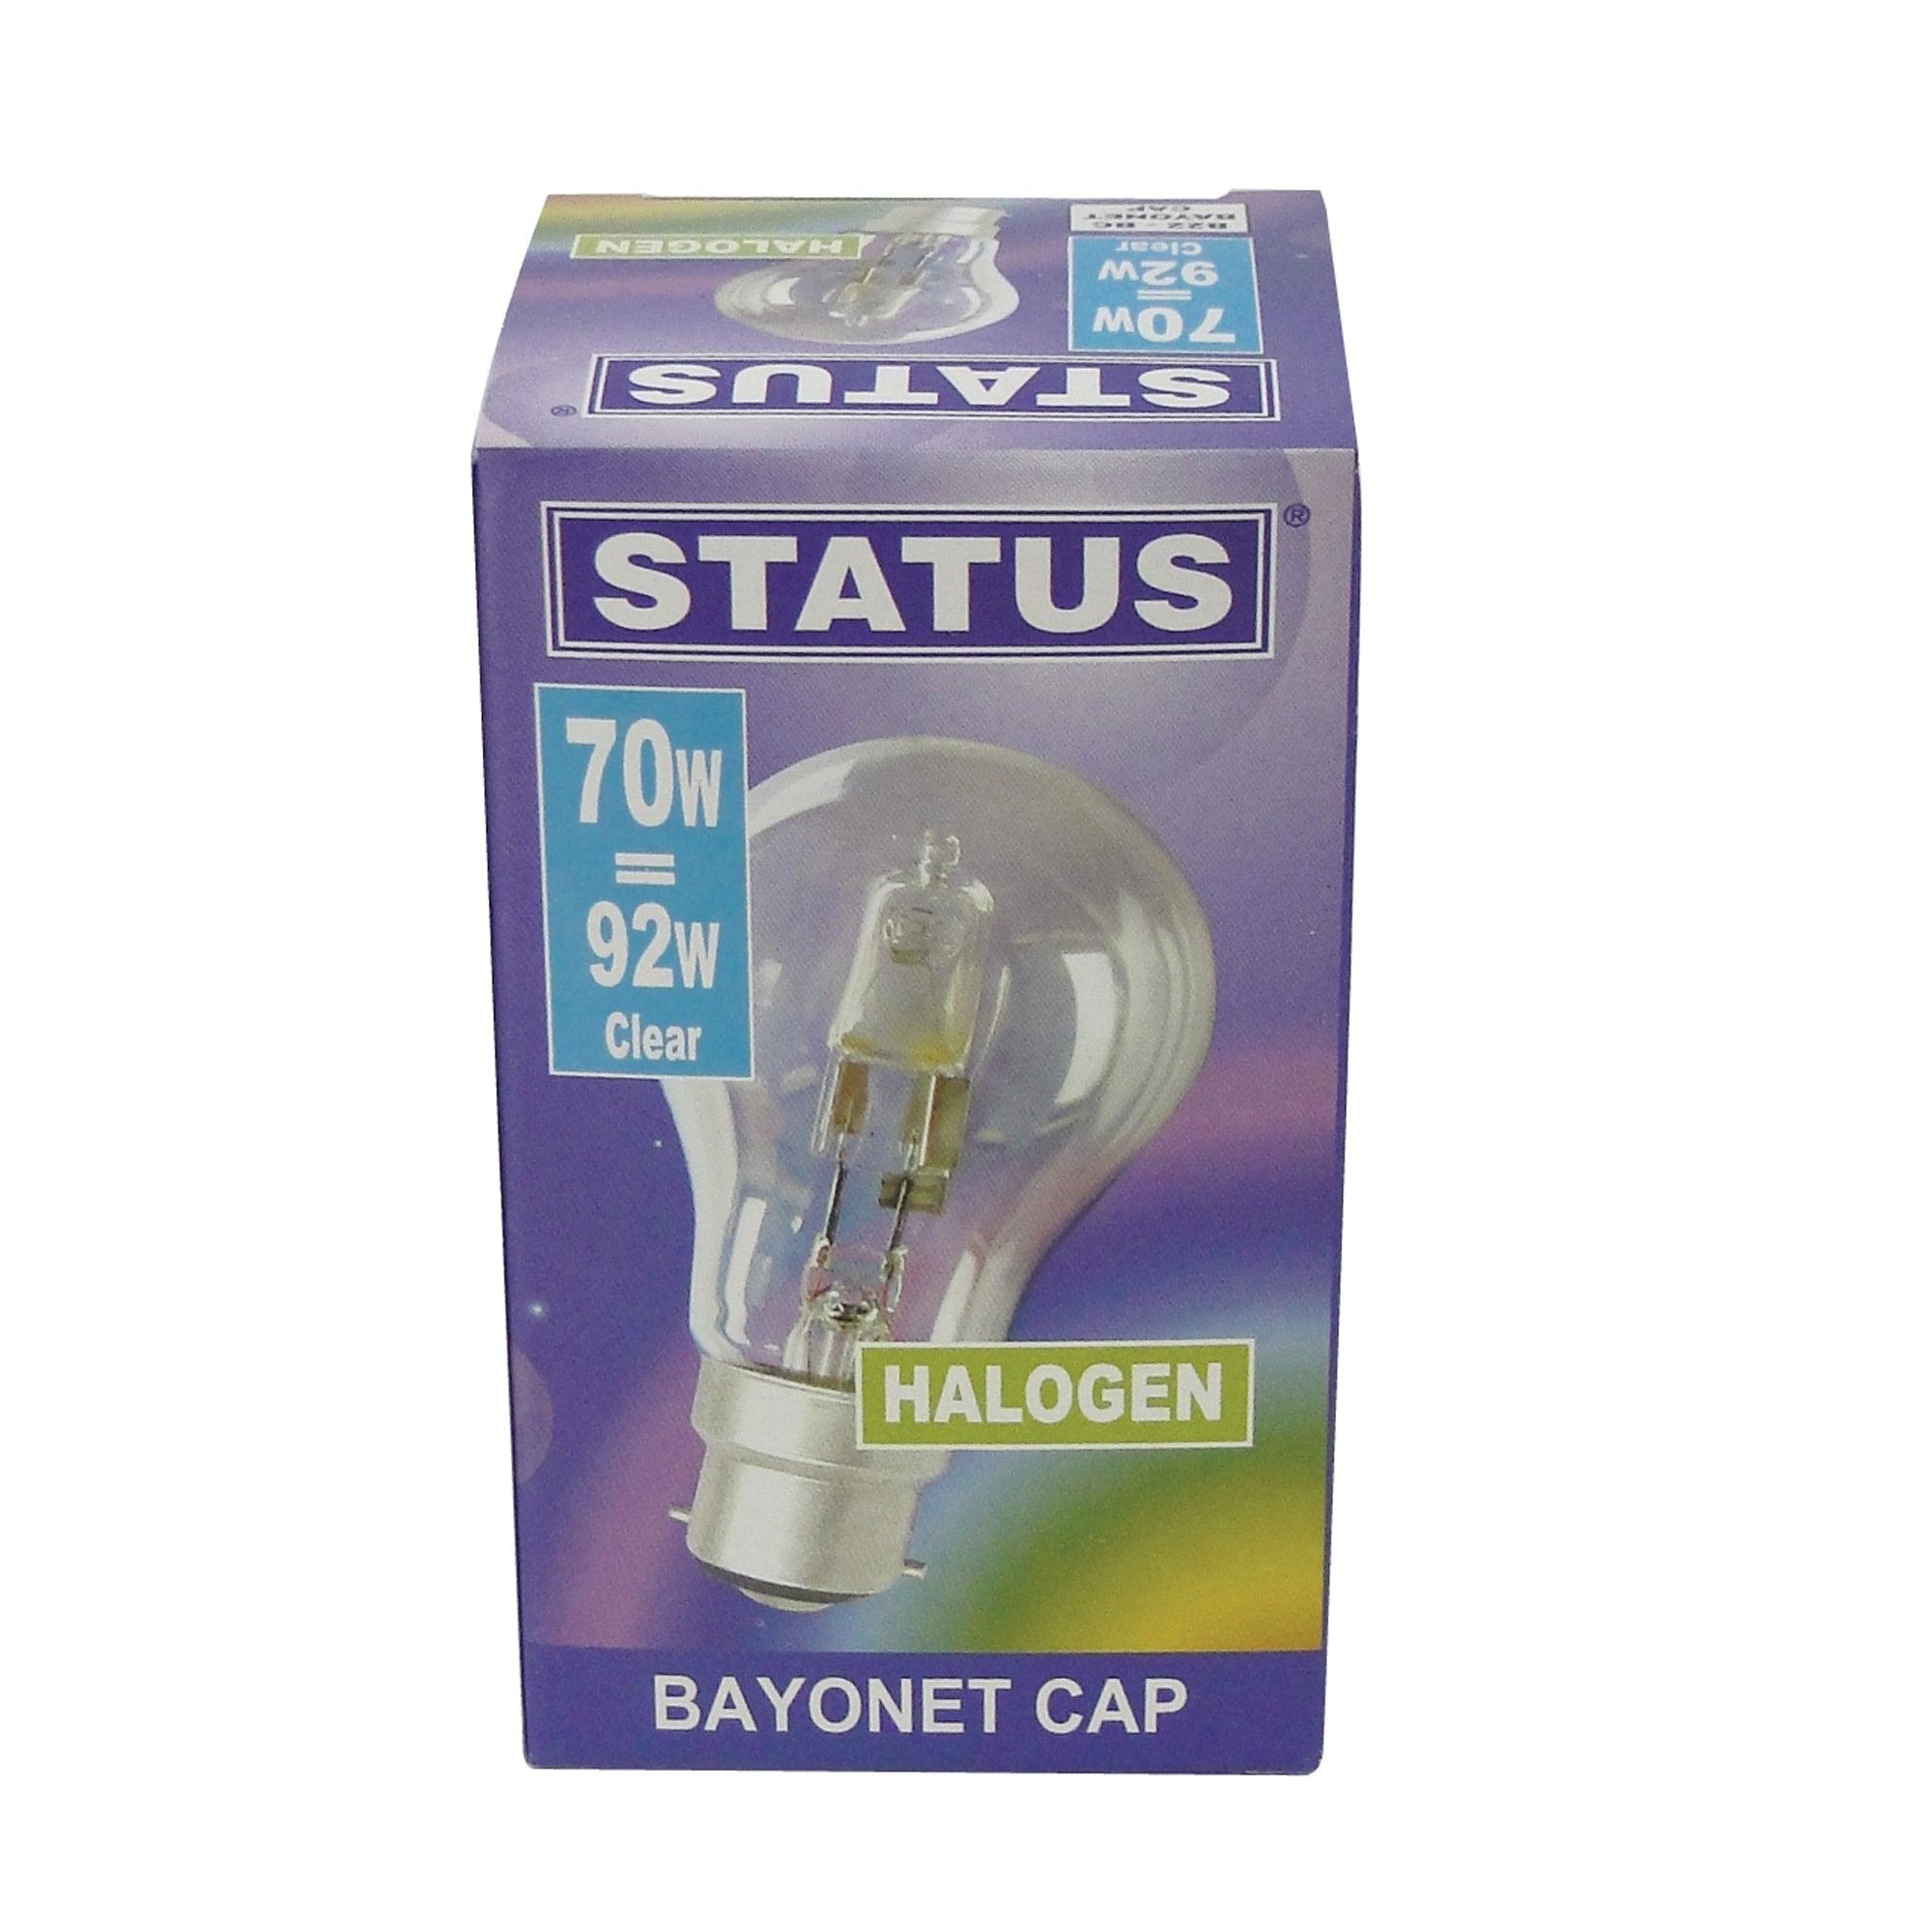 Status Halogen Energy Saver GLS 70 Watt Bulb